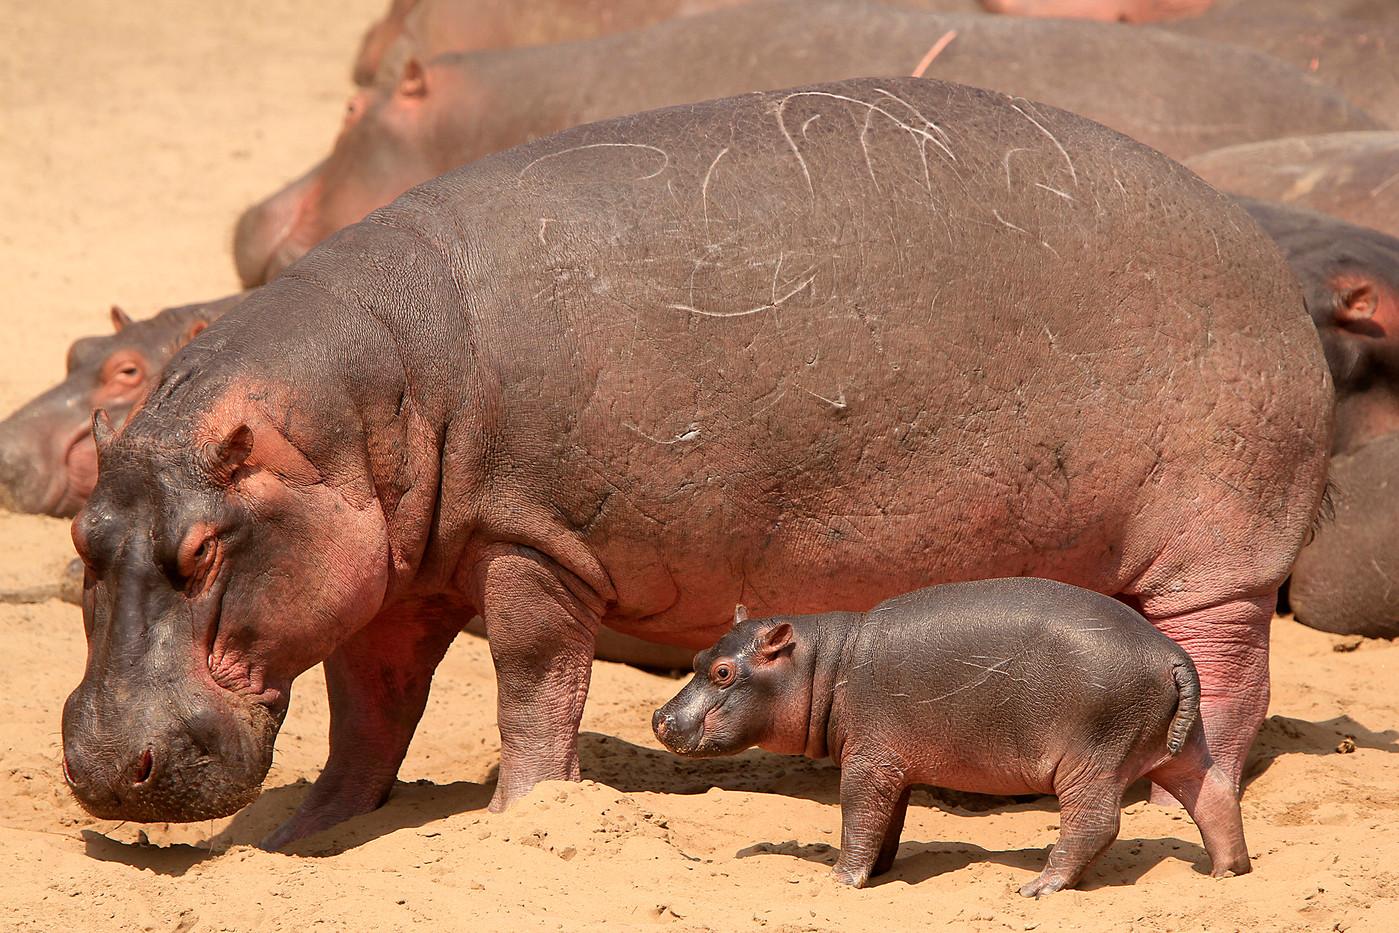 Hippo & calf in the Serengeti NP, Tanzania